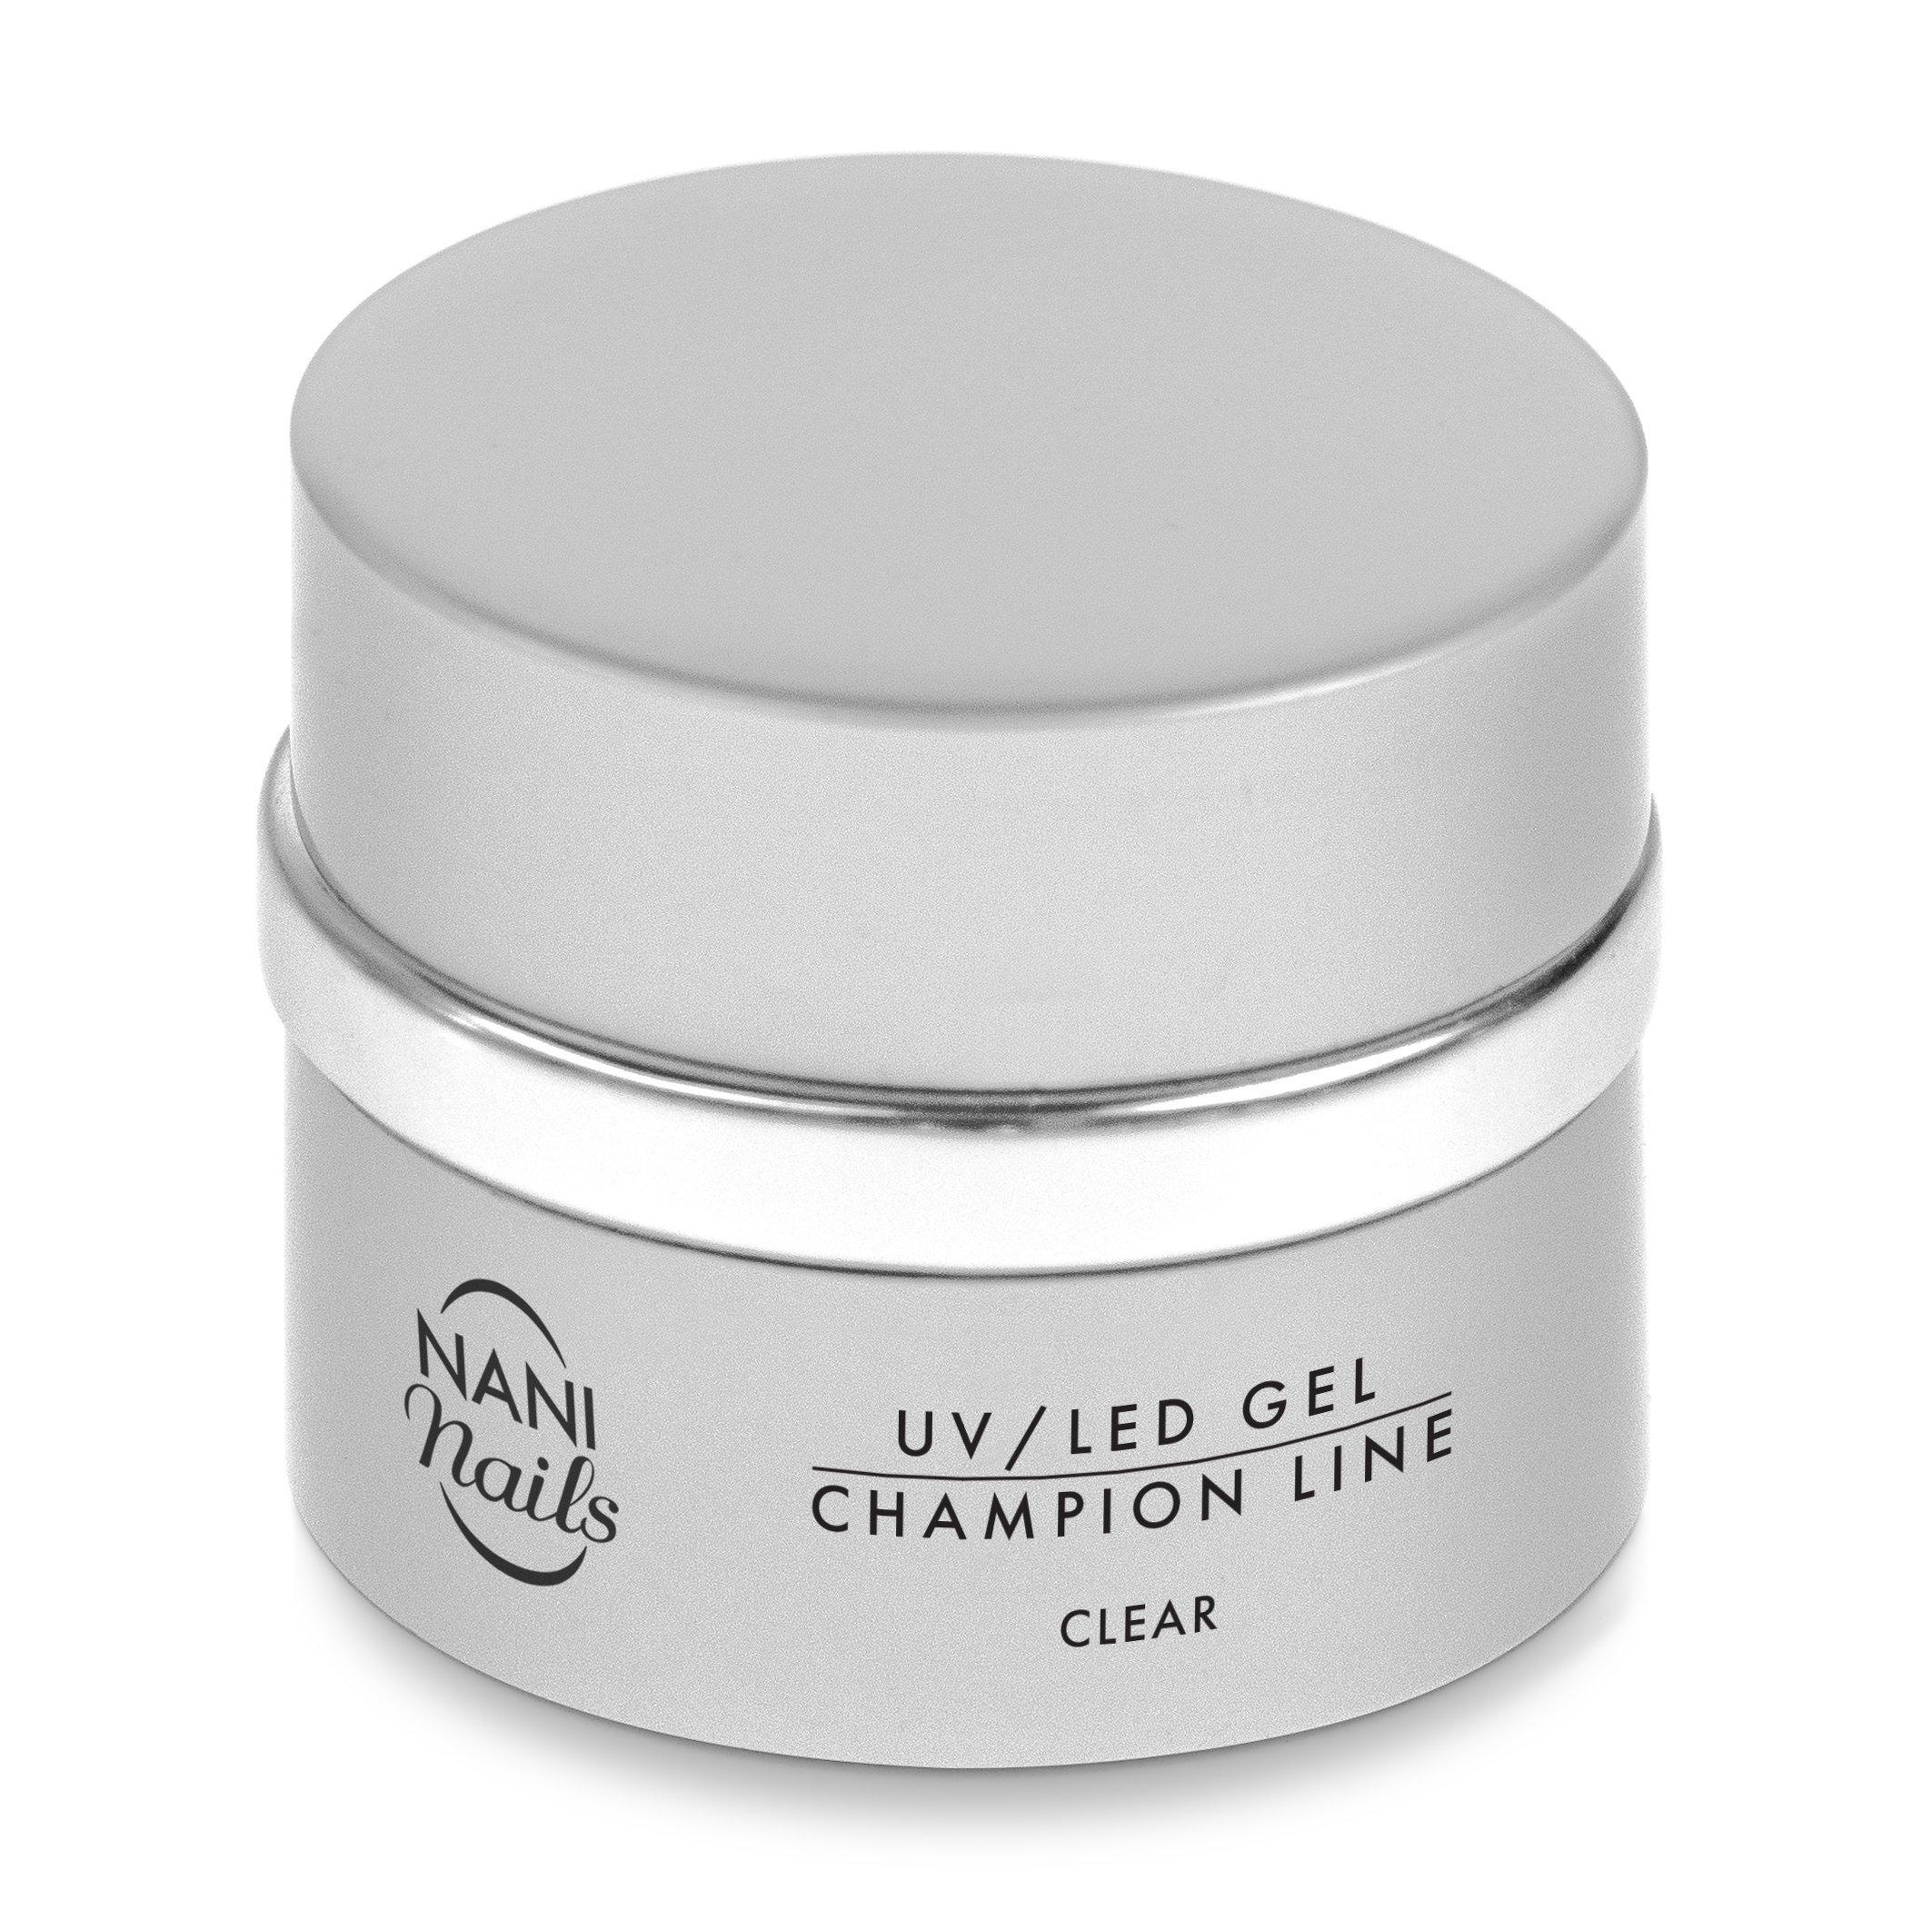 NANI UV/LED gél Champion Line 50 ml - Clear